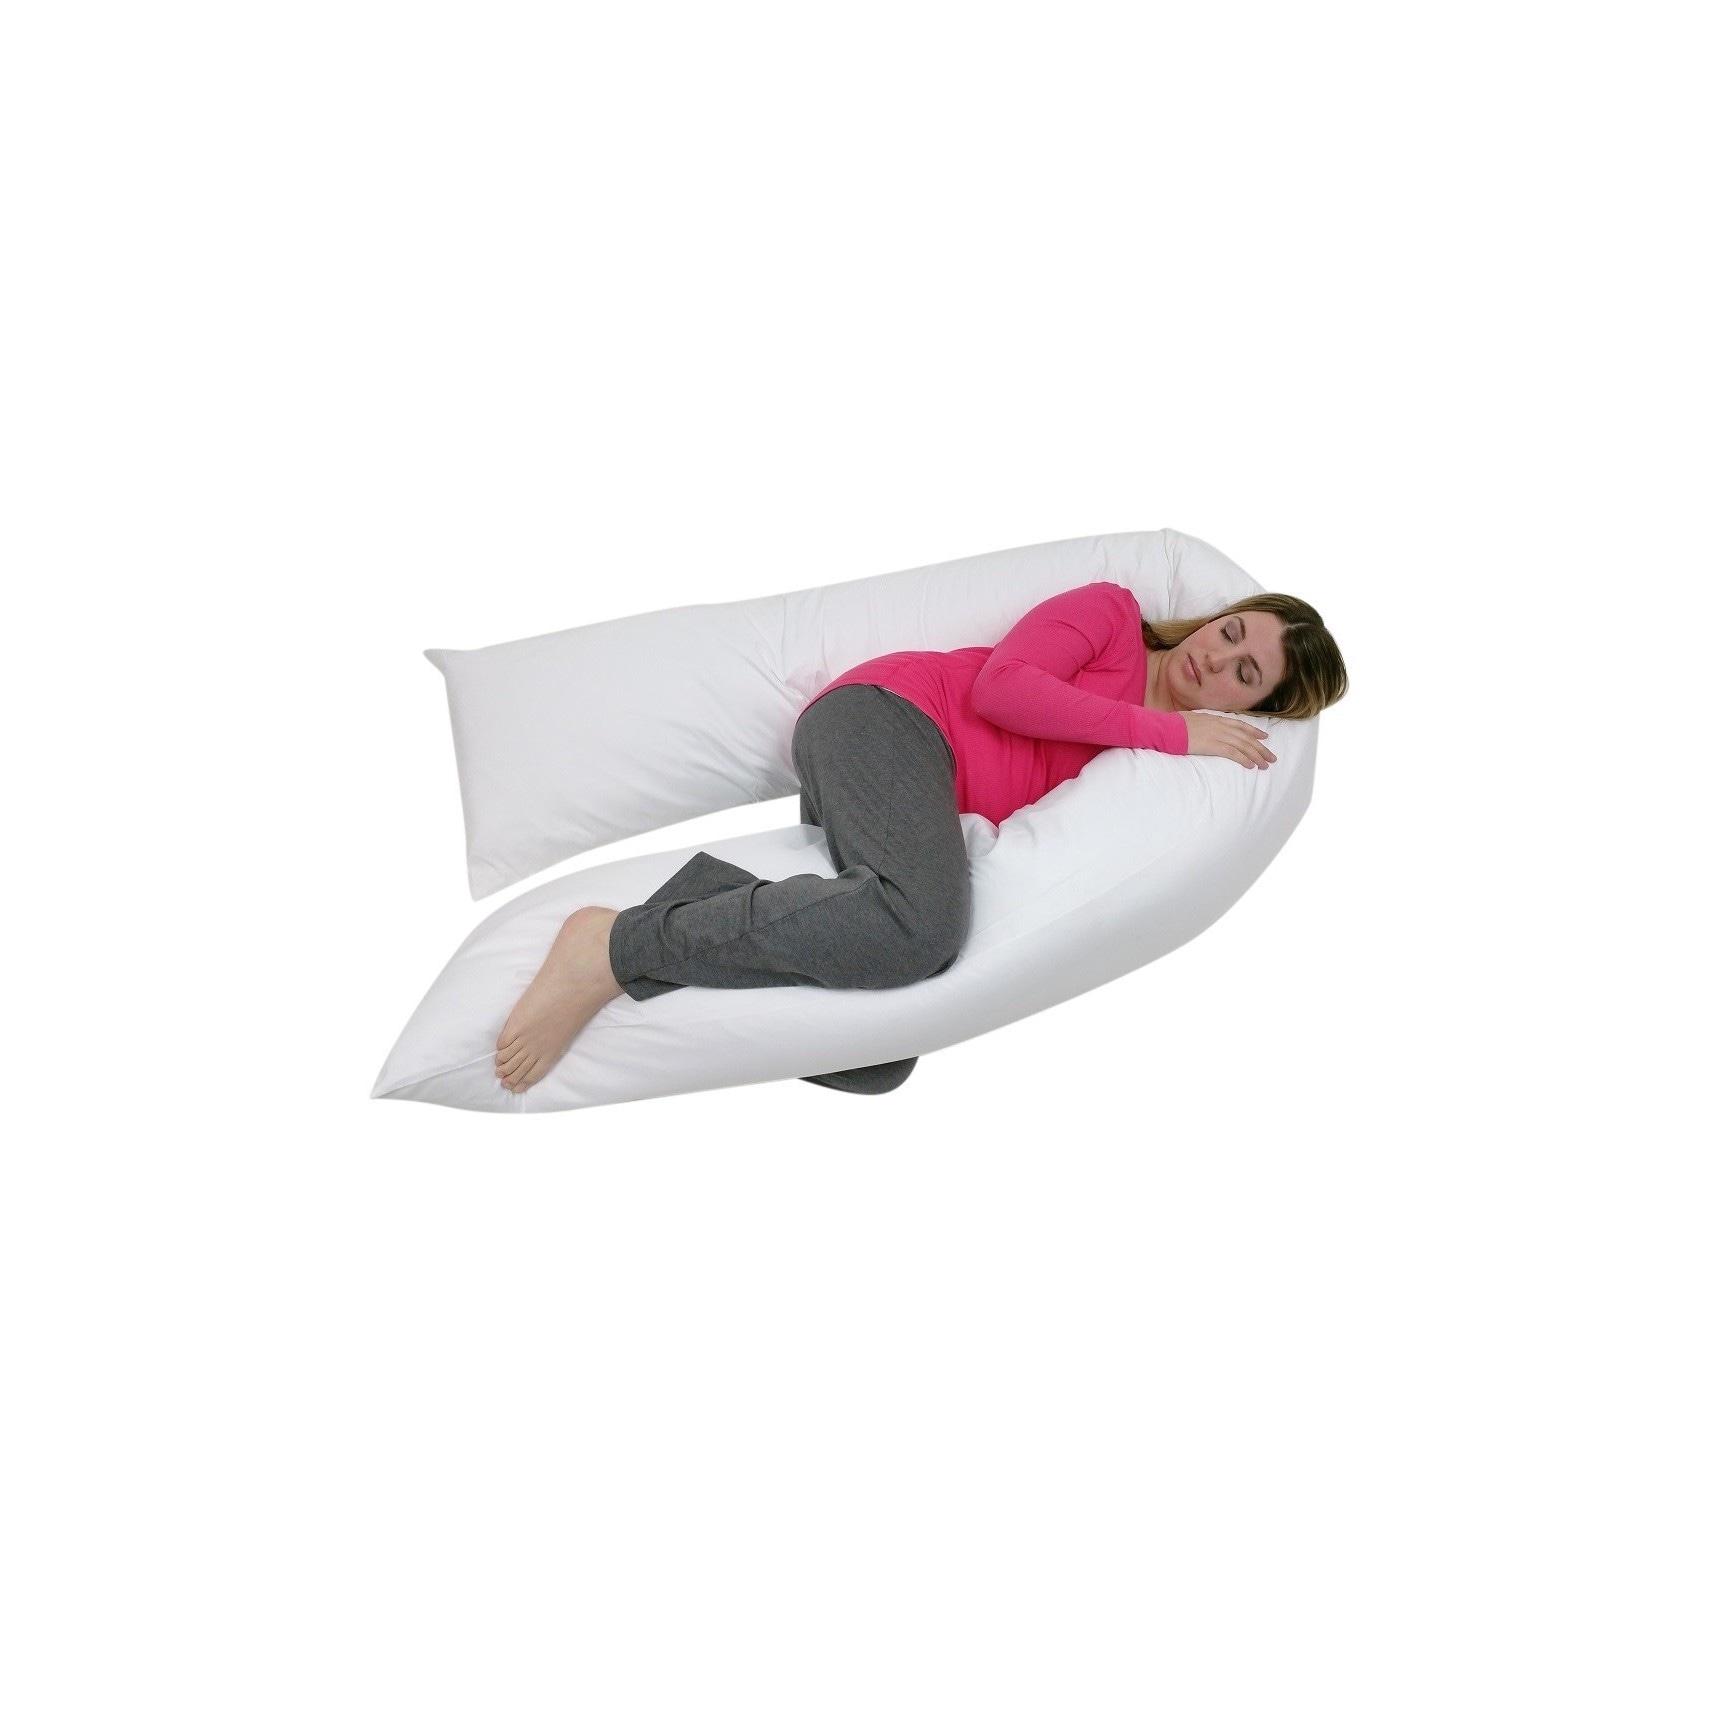 Junior Size Total Body Pregnancy Maternity Pillow (White)...